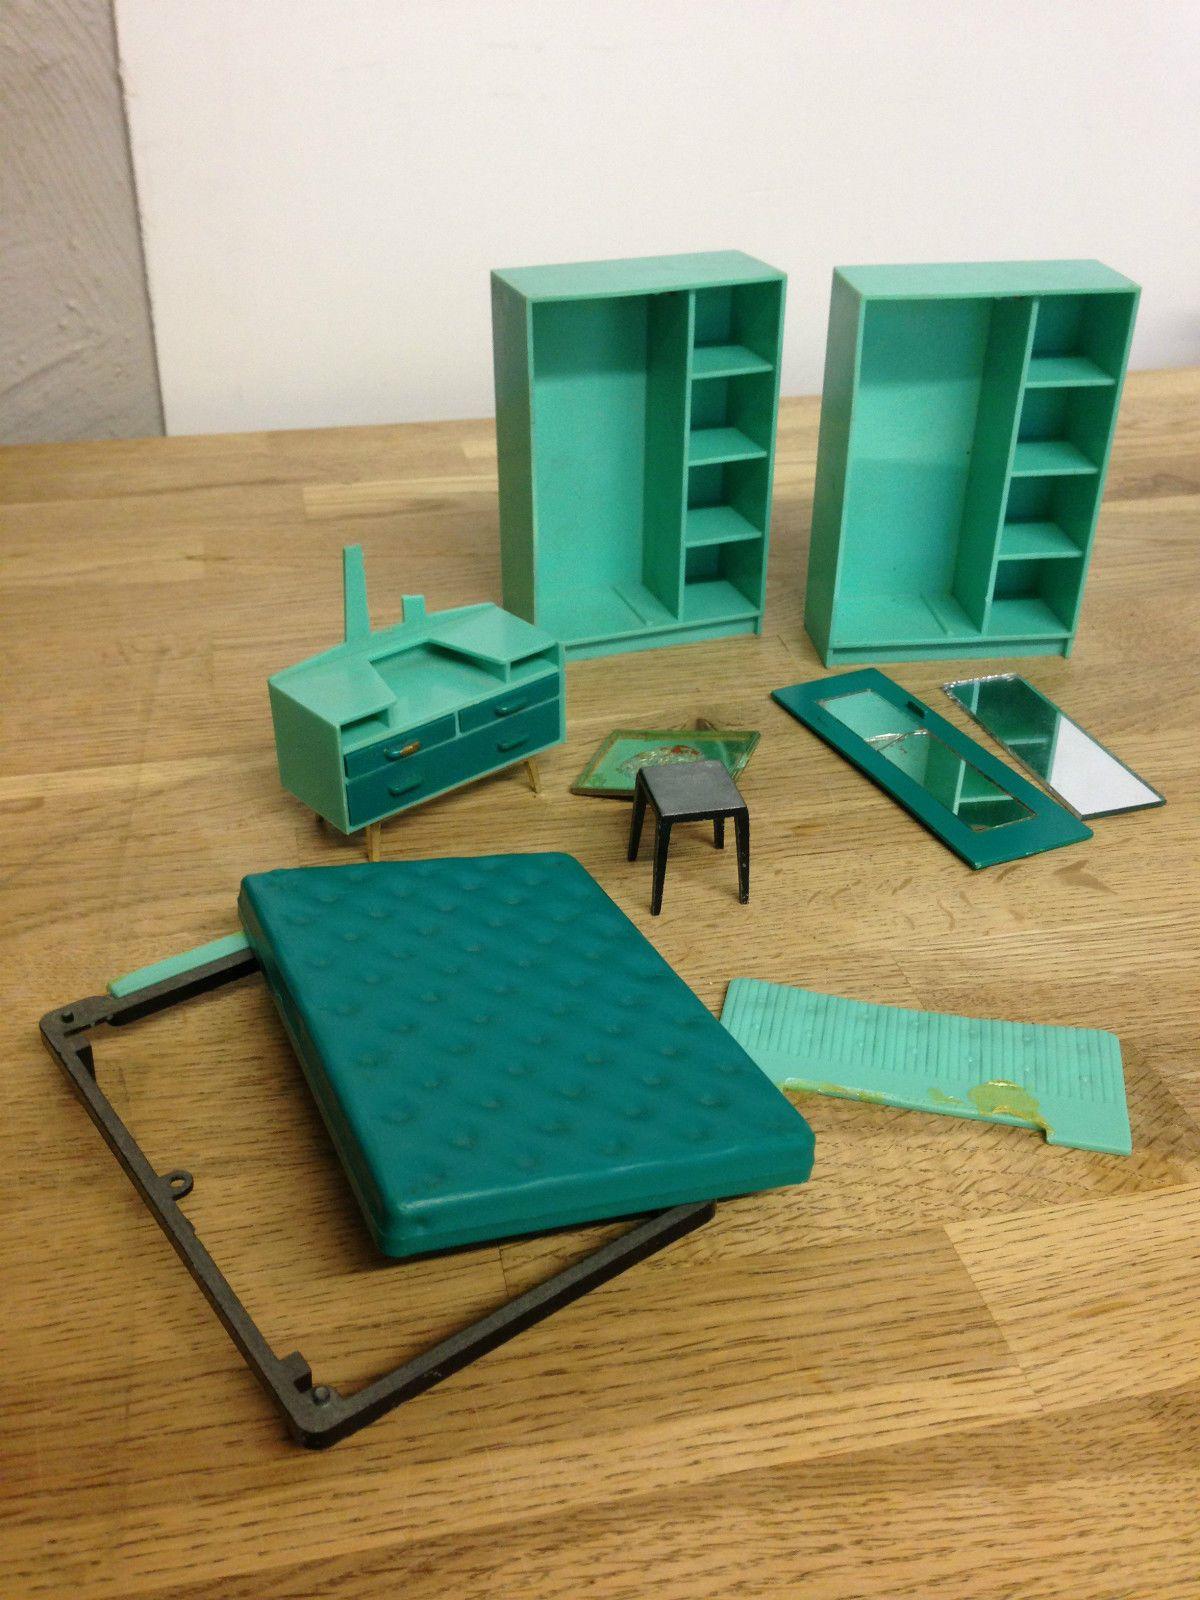 Vintage Retro Triang Spot On Job Lot 1 16 Dolls House Bedroom Spares Repair  | EBay